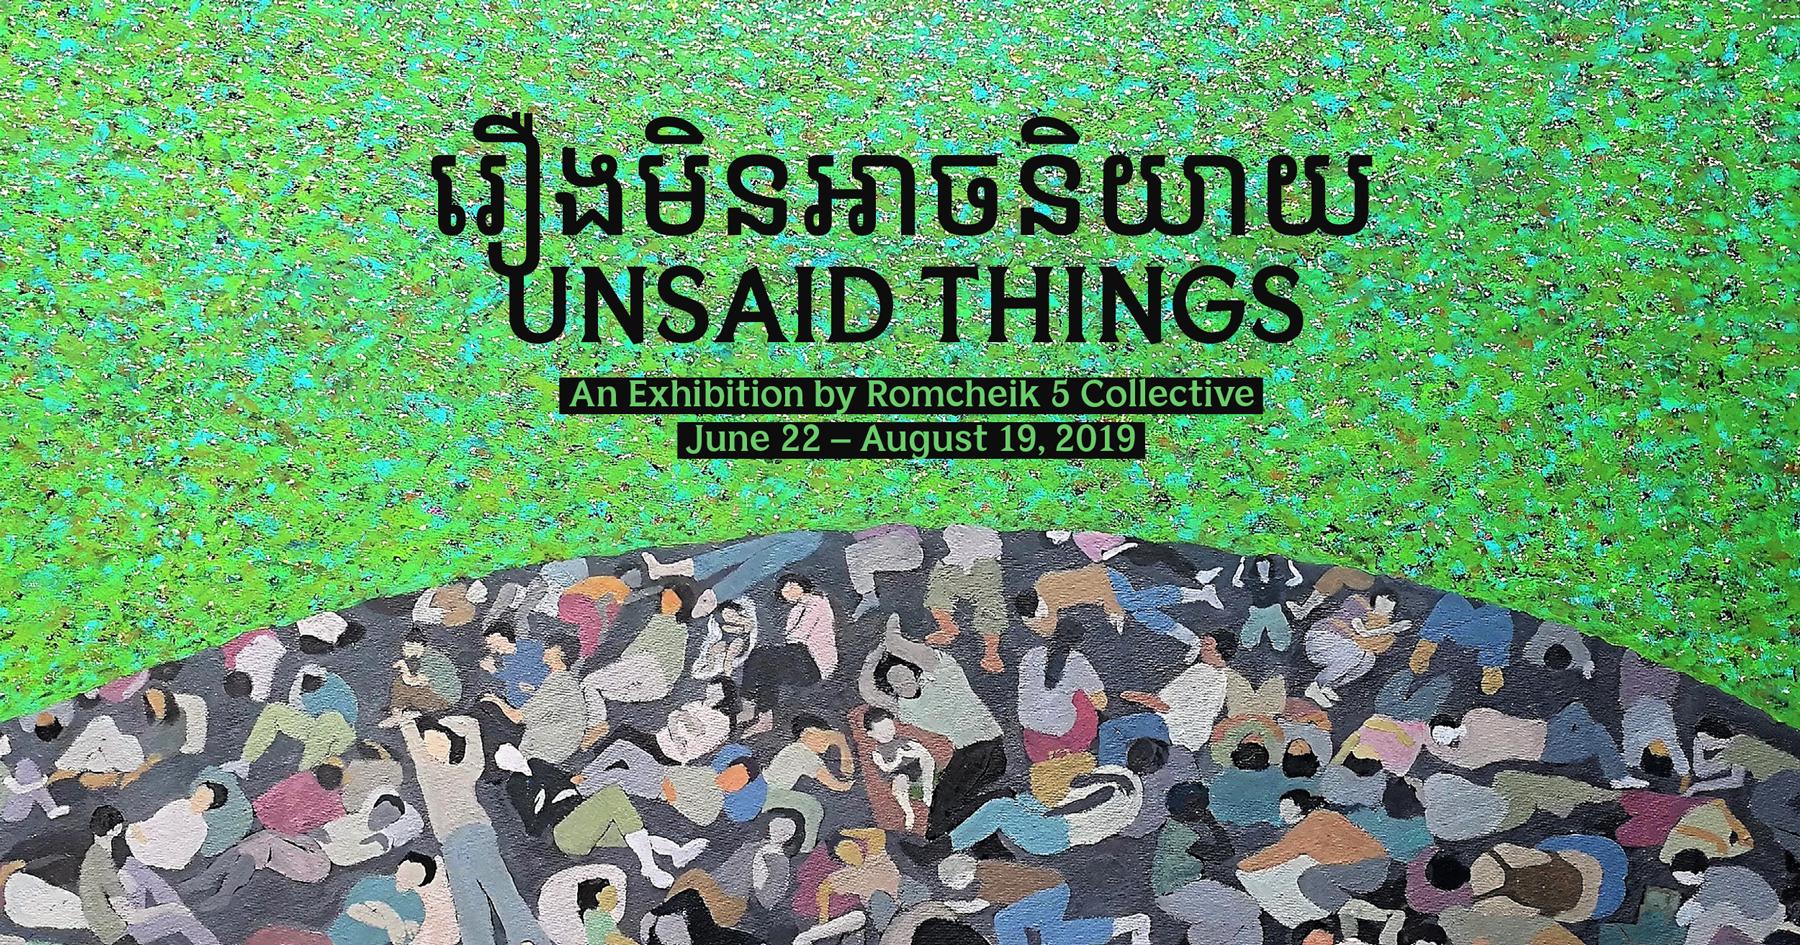 Romcheik Pram at MIRAGE Contemporary Art Space in Siem Reap, Cambodia